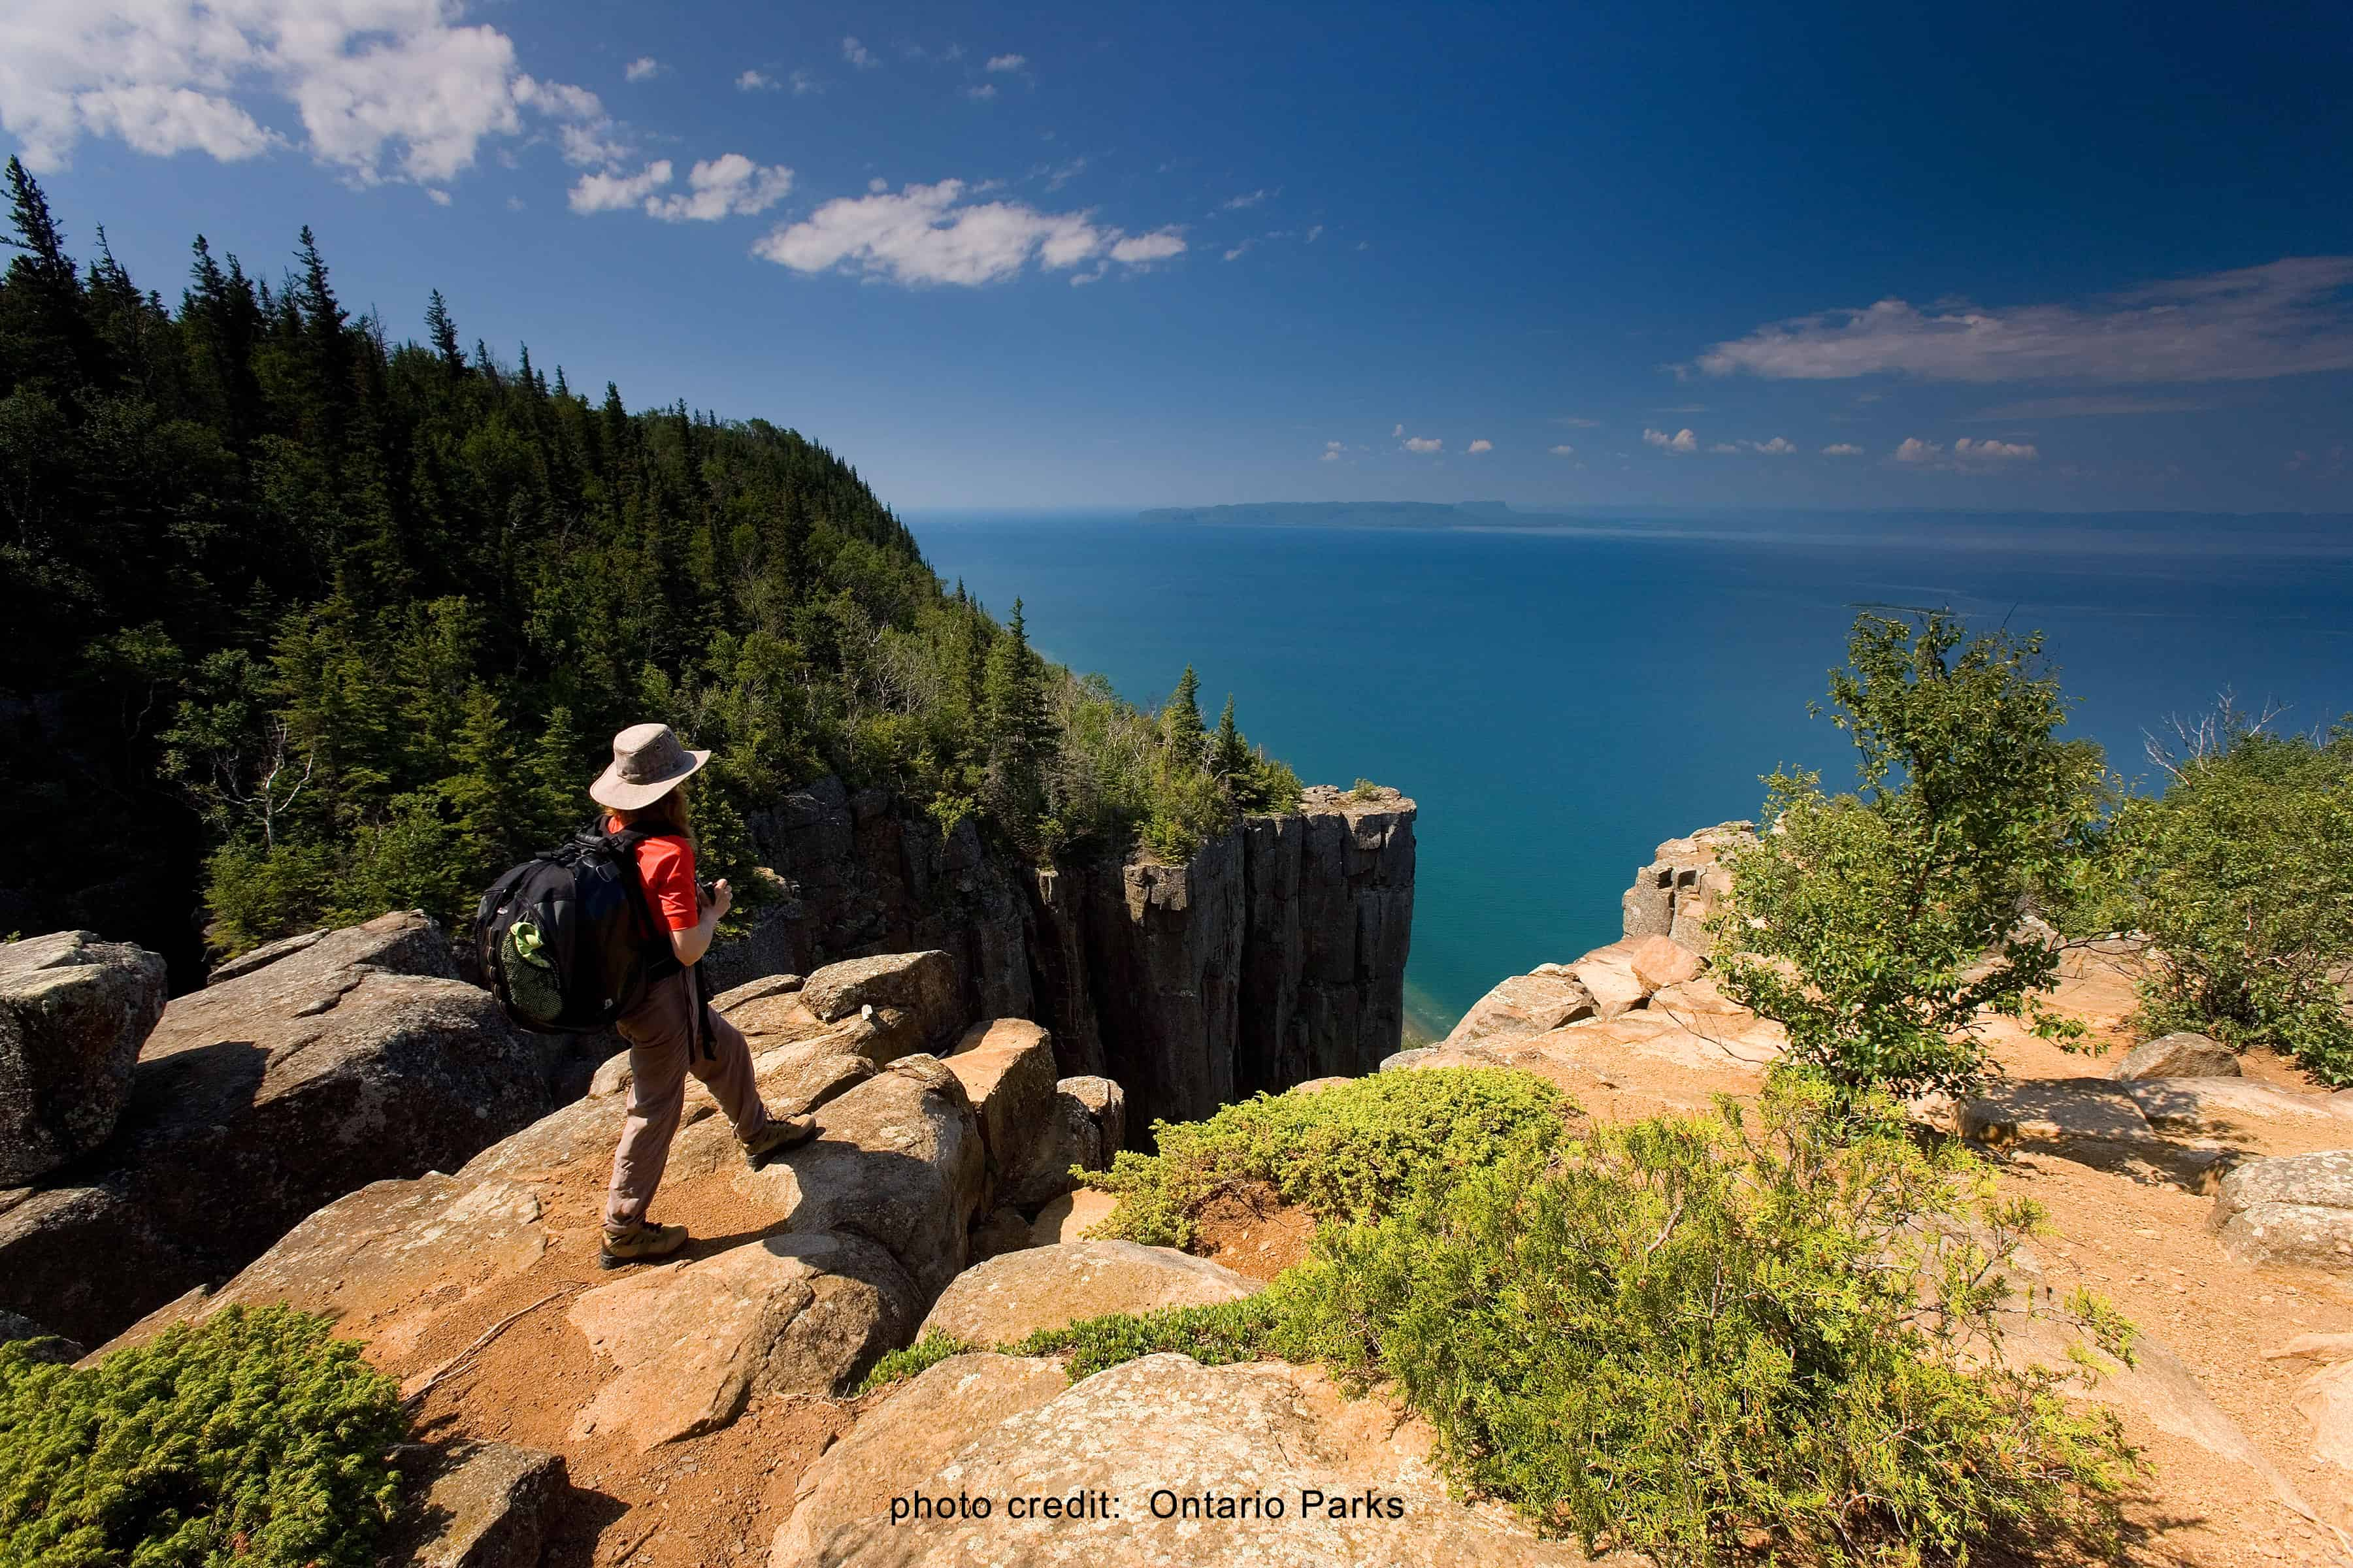 Great Hikes Amp Tasty Brews In Thunder Bay Explore Magazine